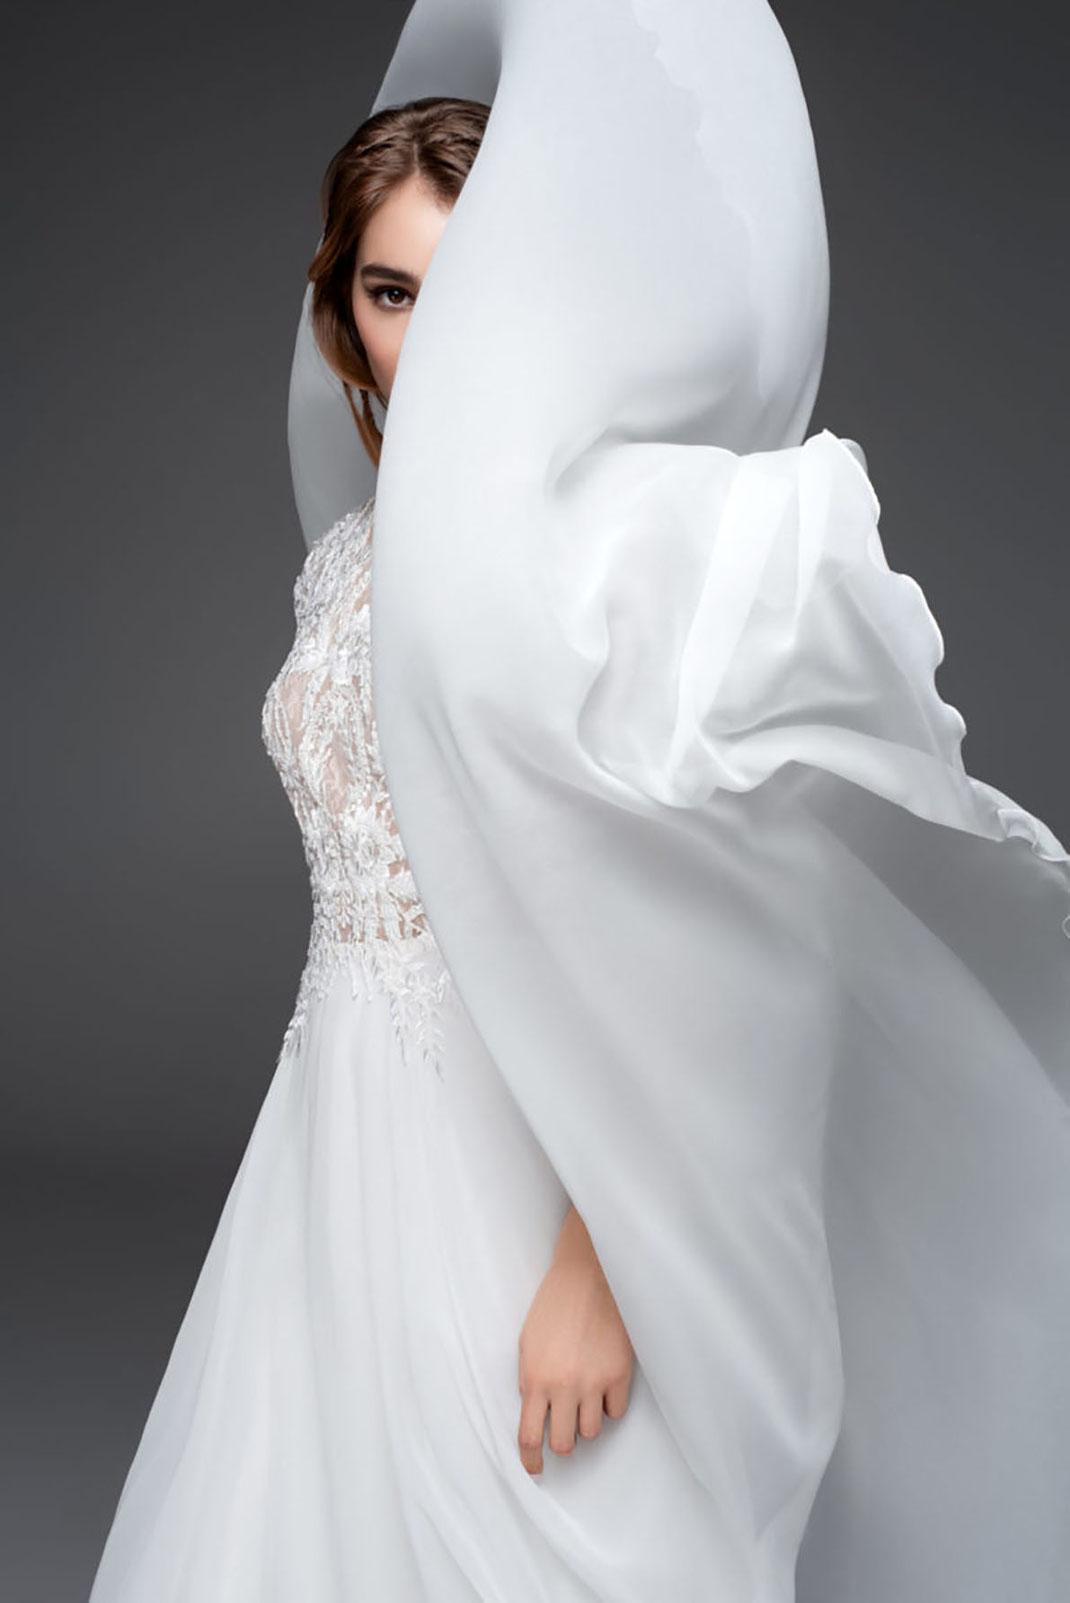 Brautkleid Brave aus der Sadoni 2022 Kollektion